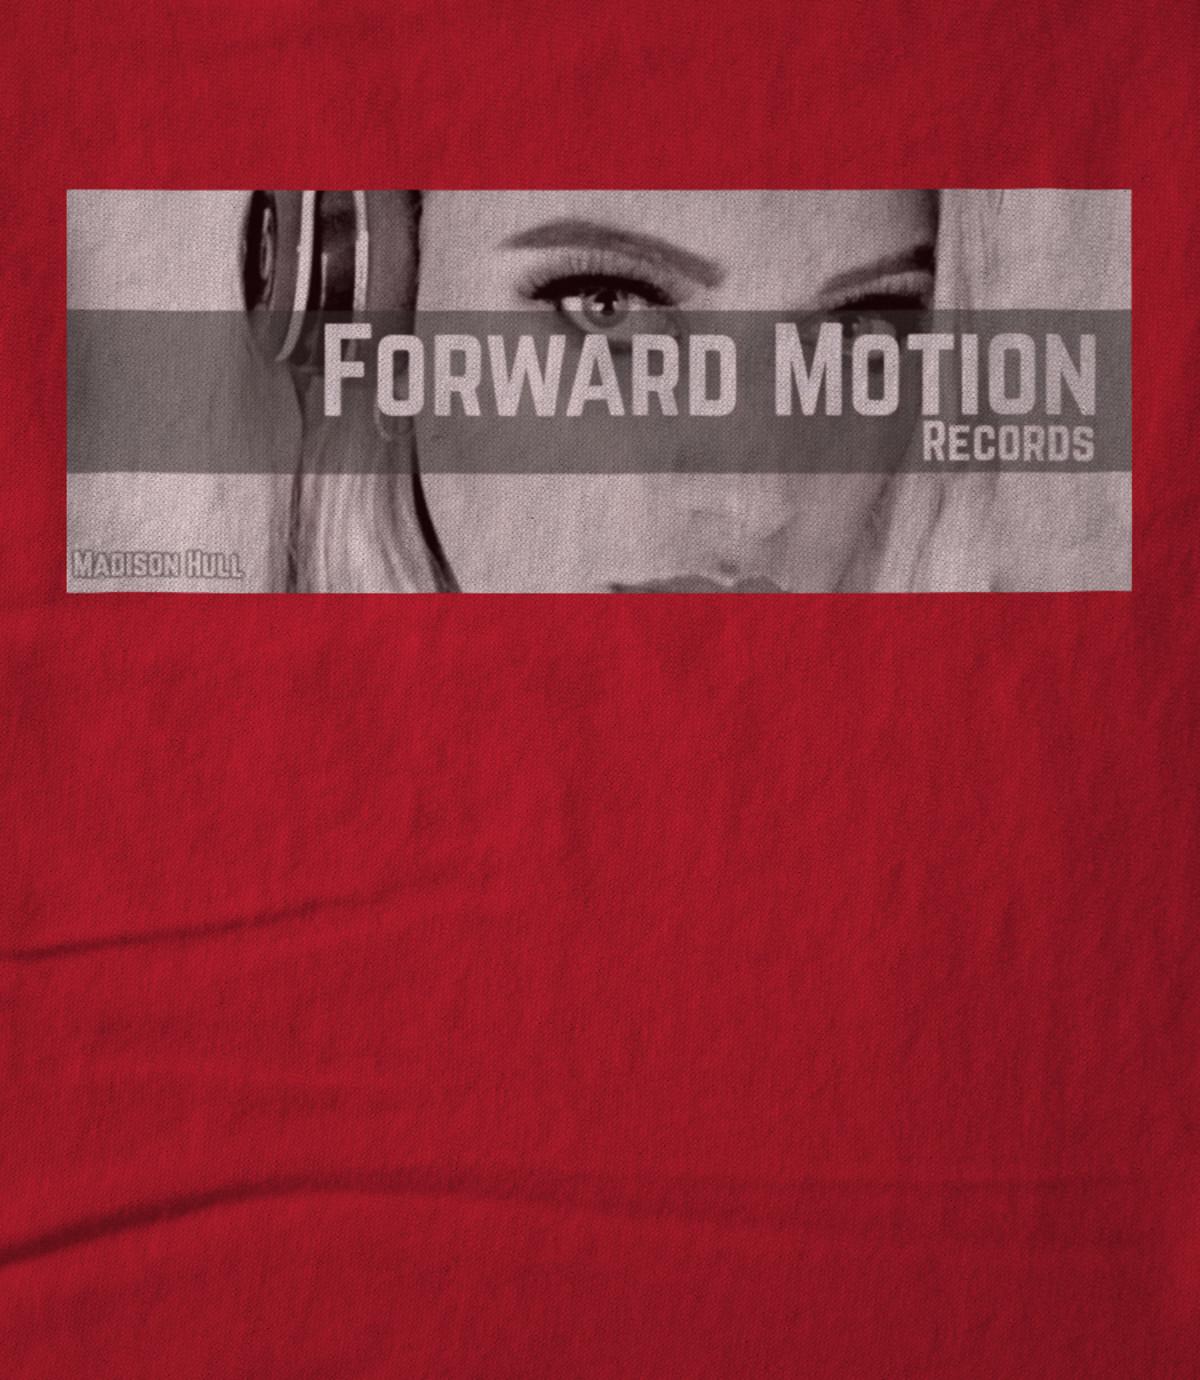 Forward motion records  uk  forward motion records 1536577734